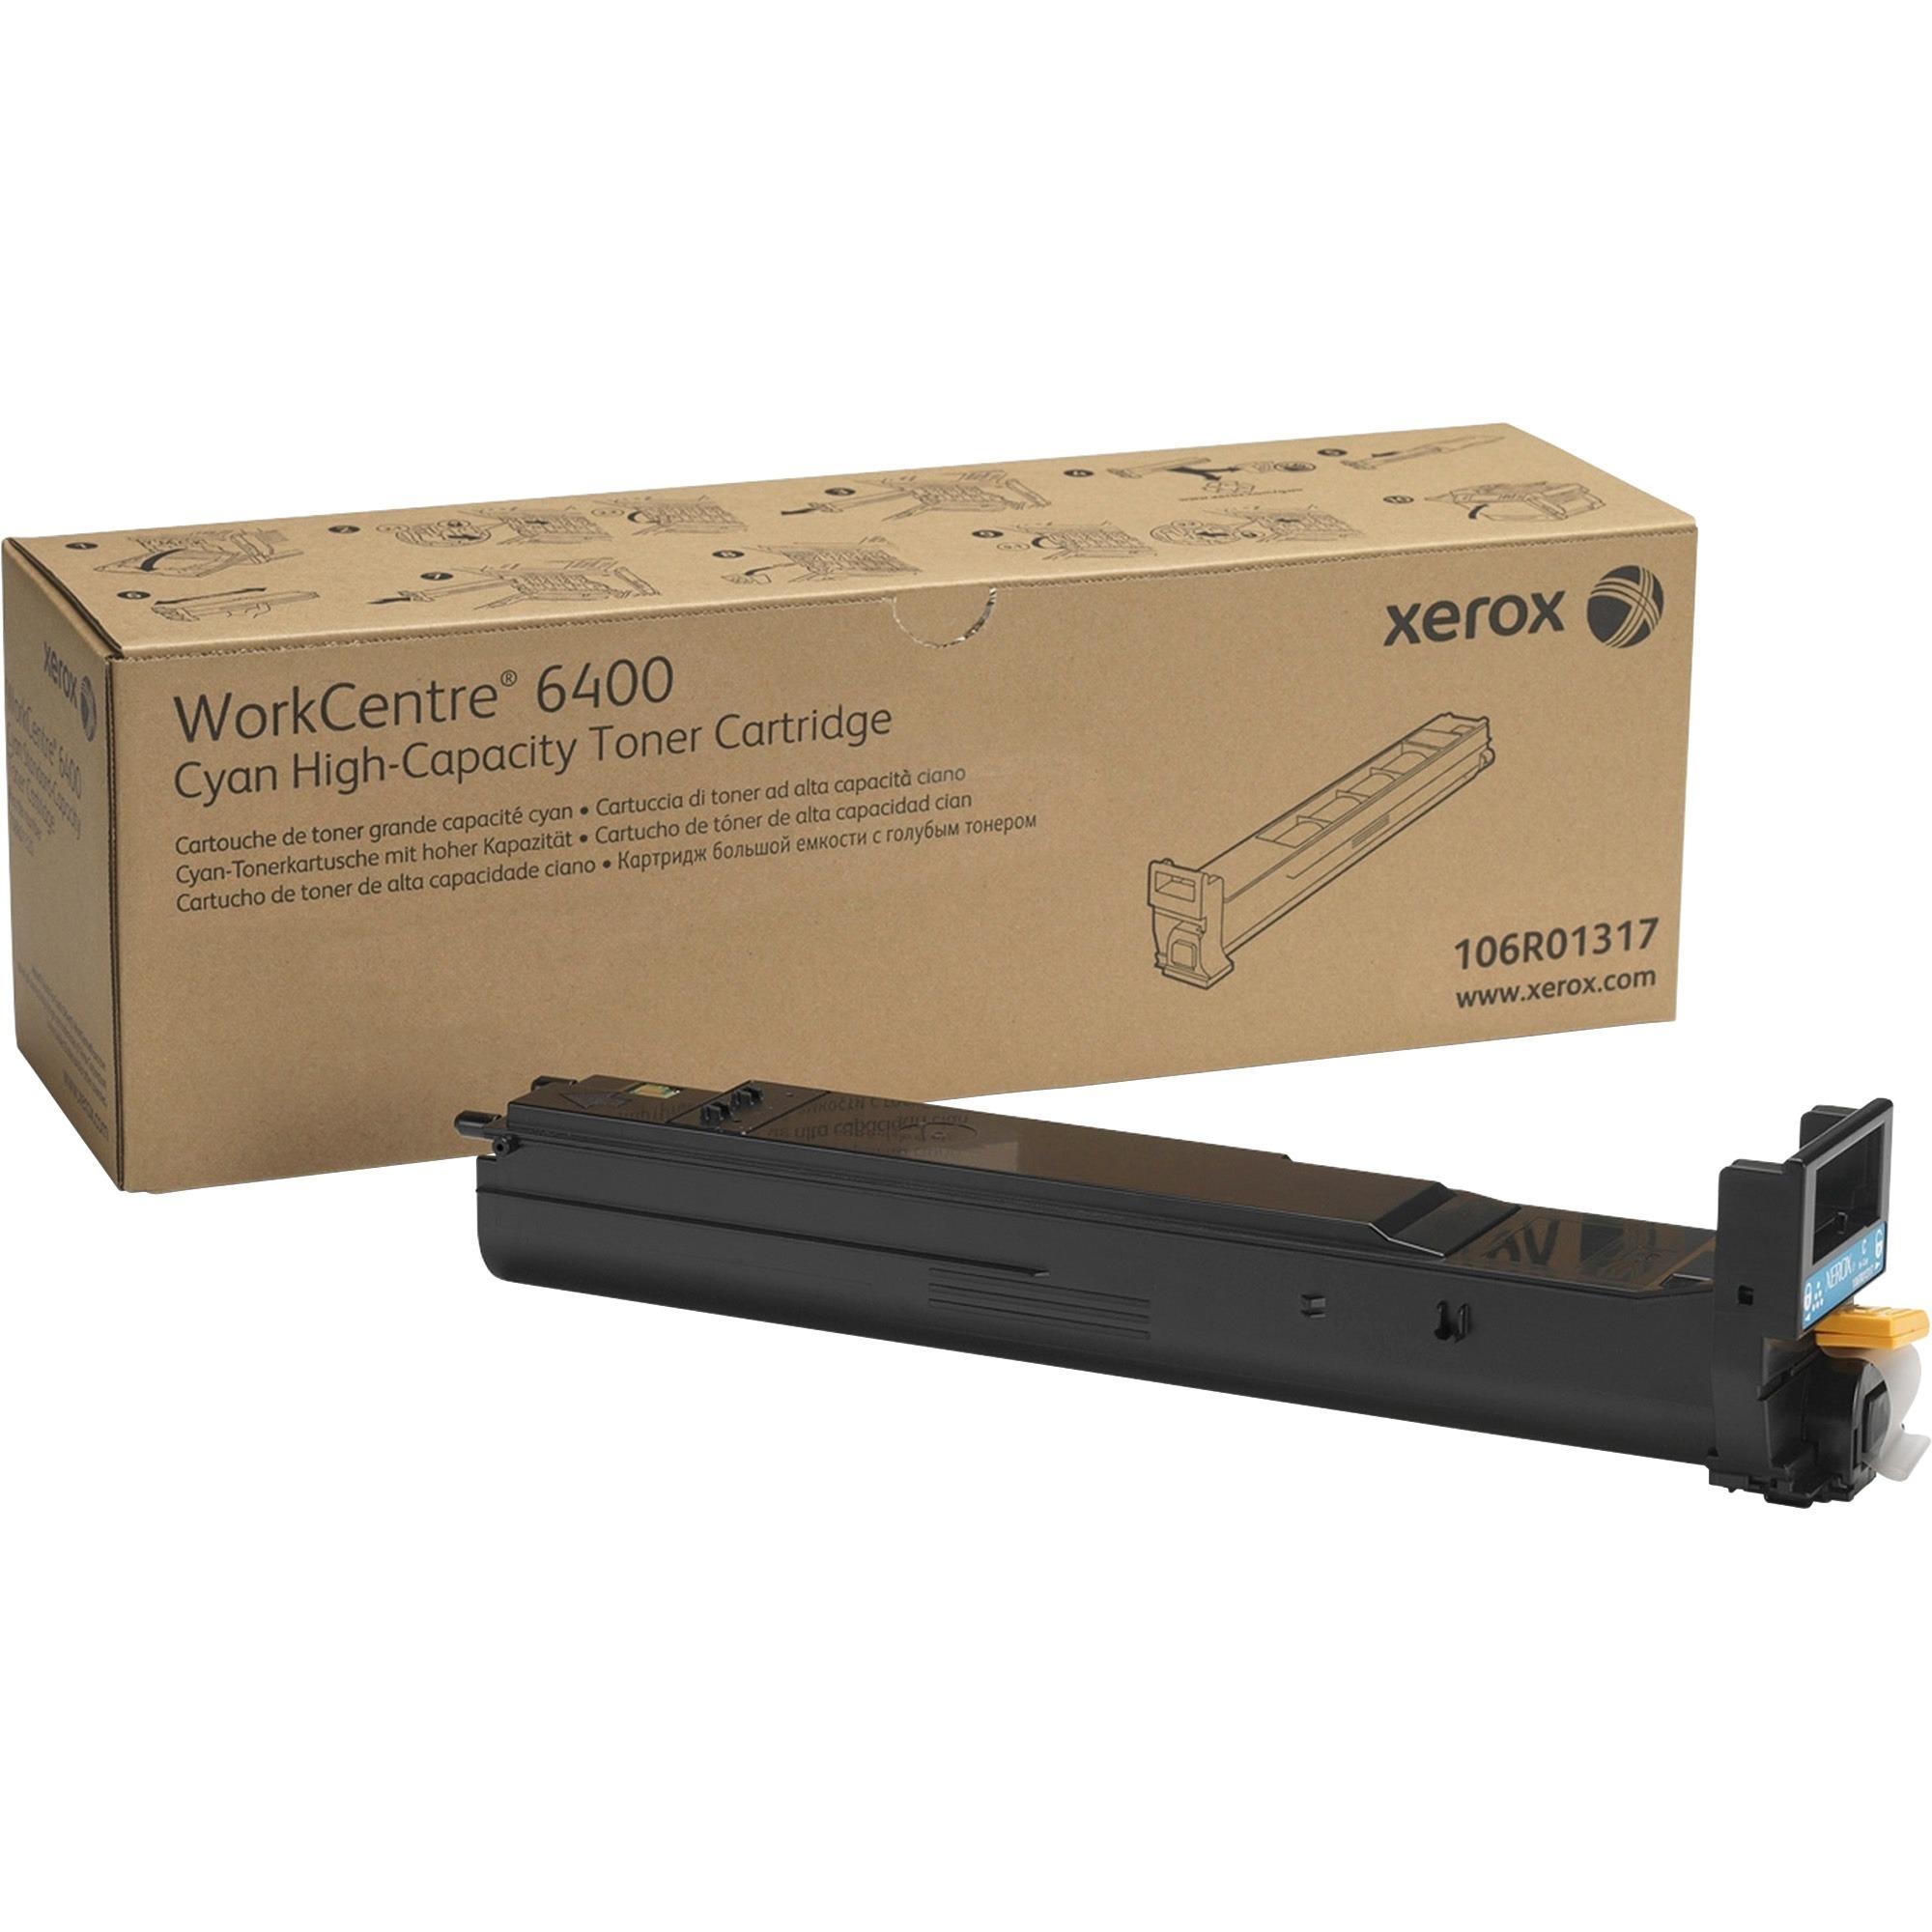 Xerox 106R01316 Toner Cartridge